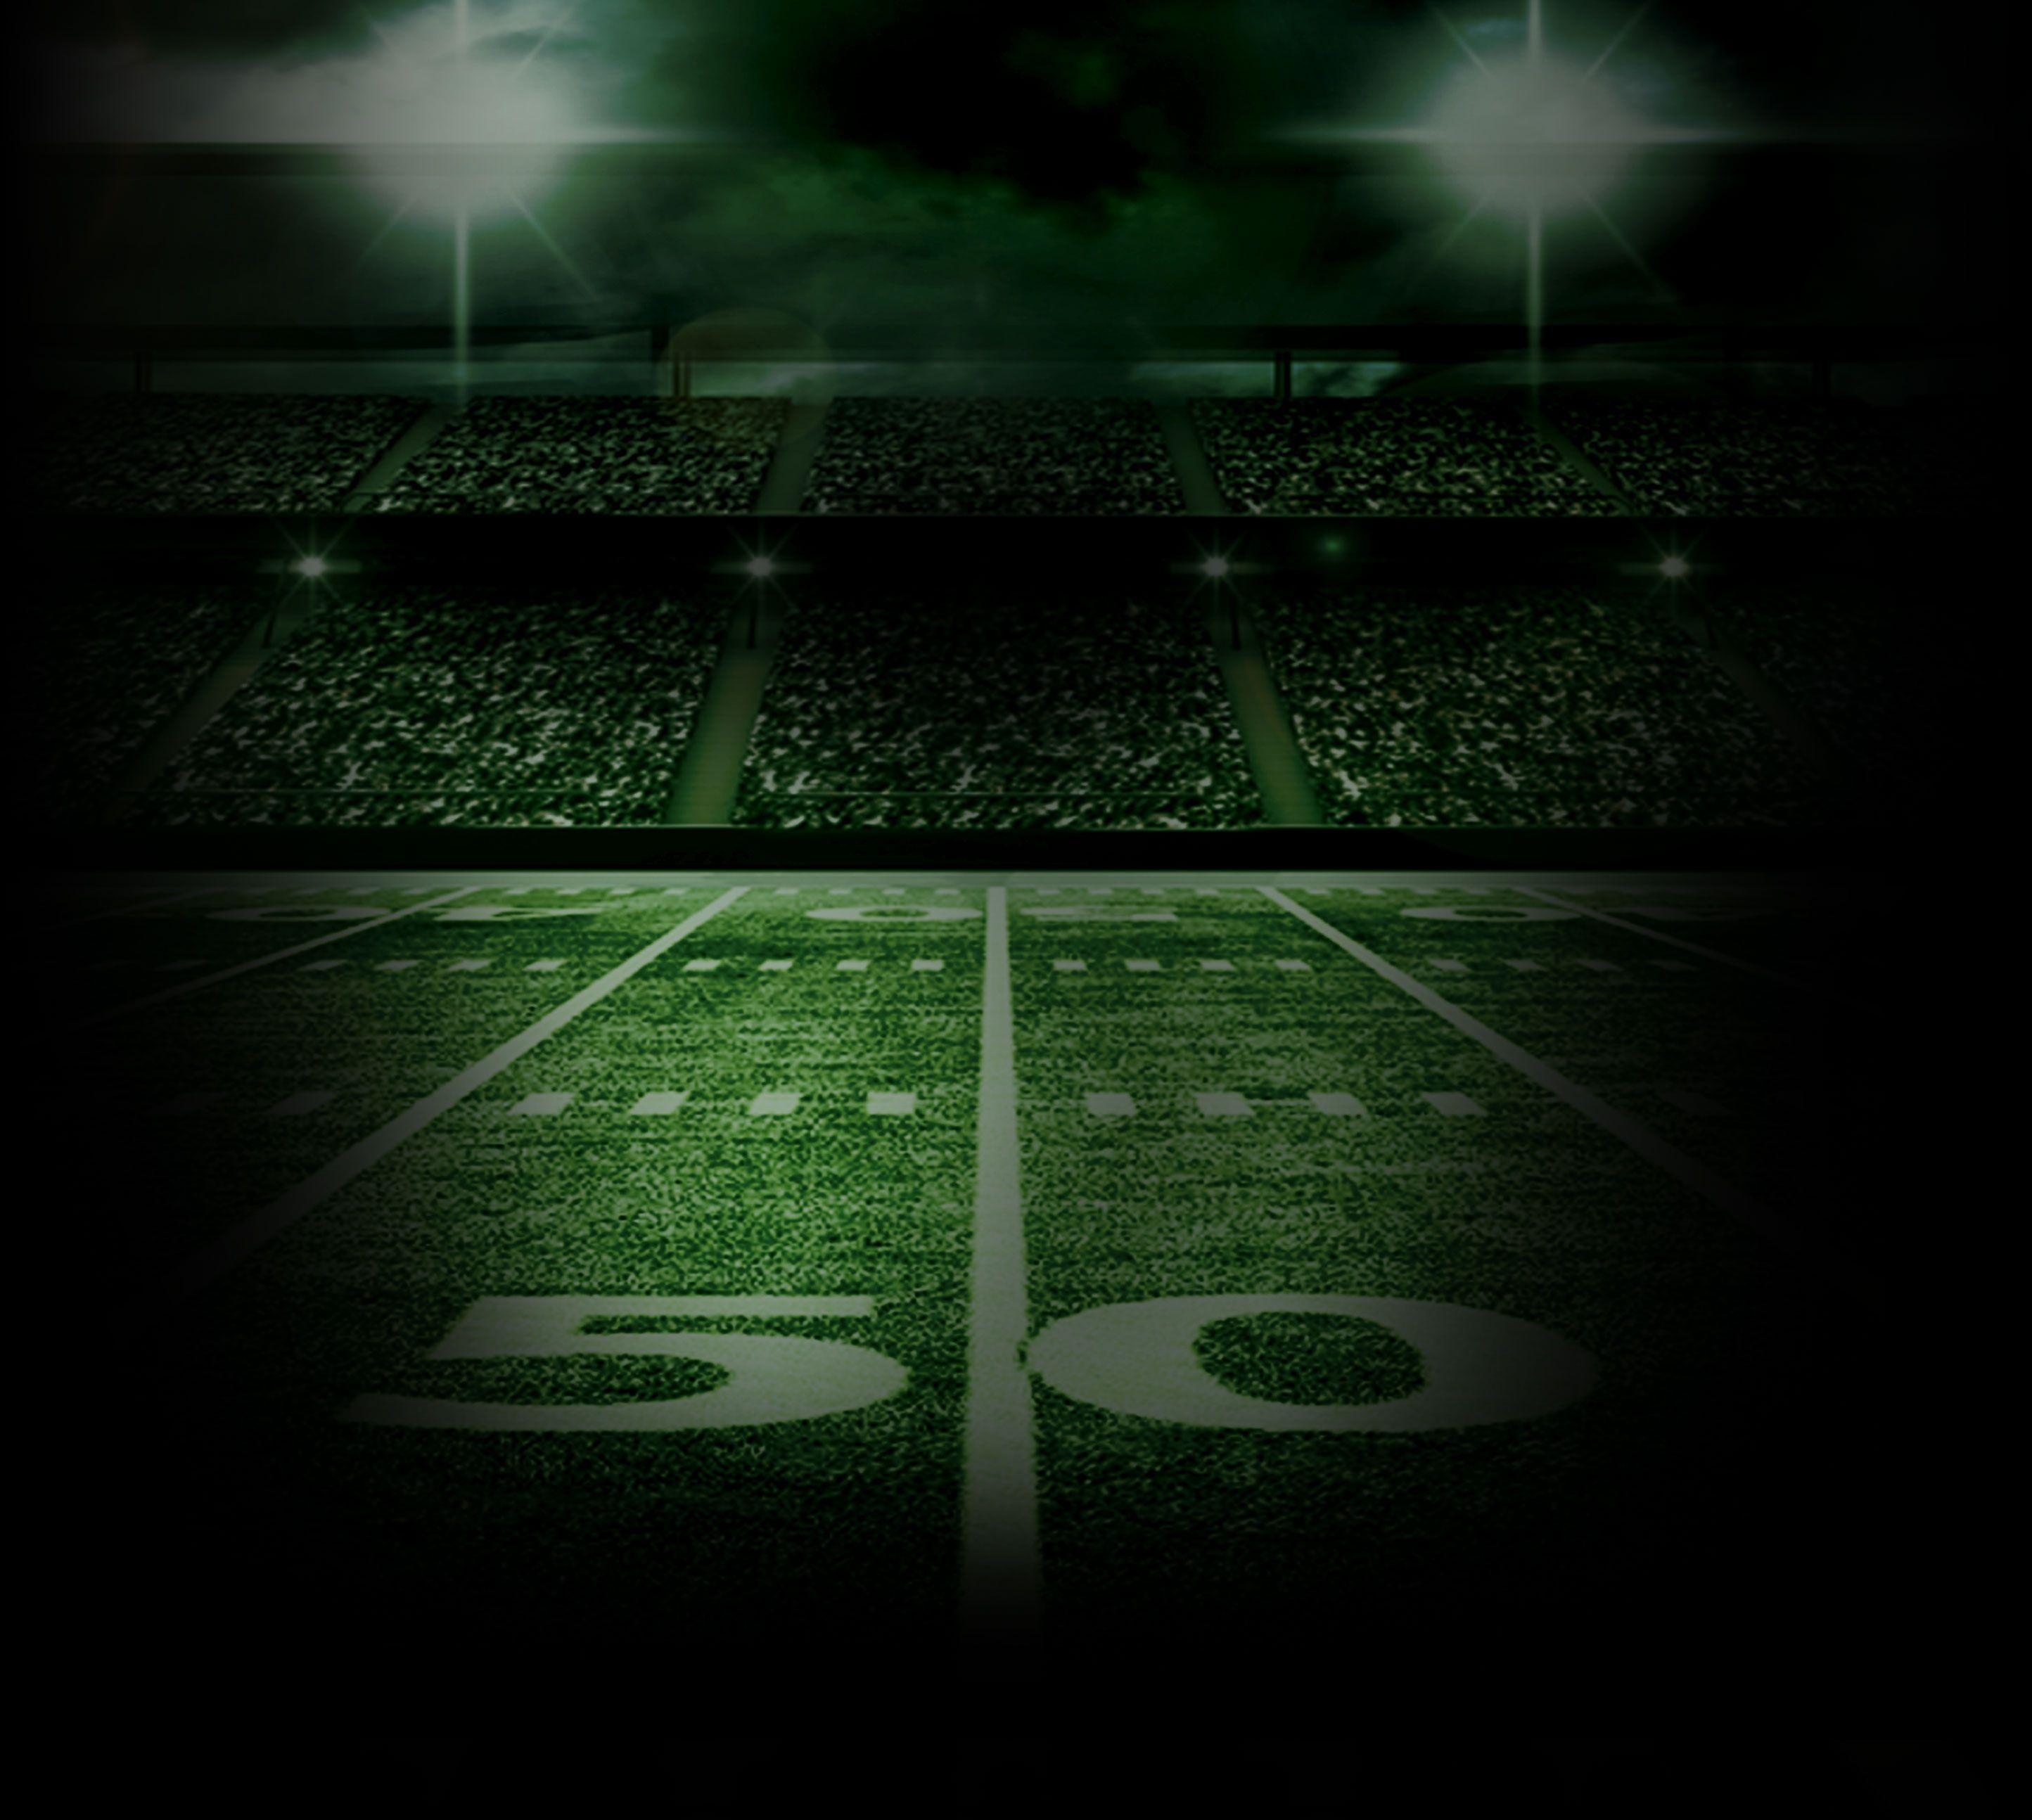 Background Dark Football Stadium